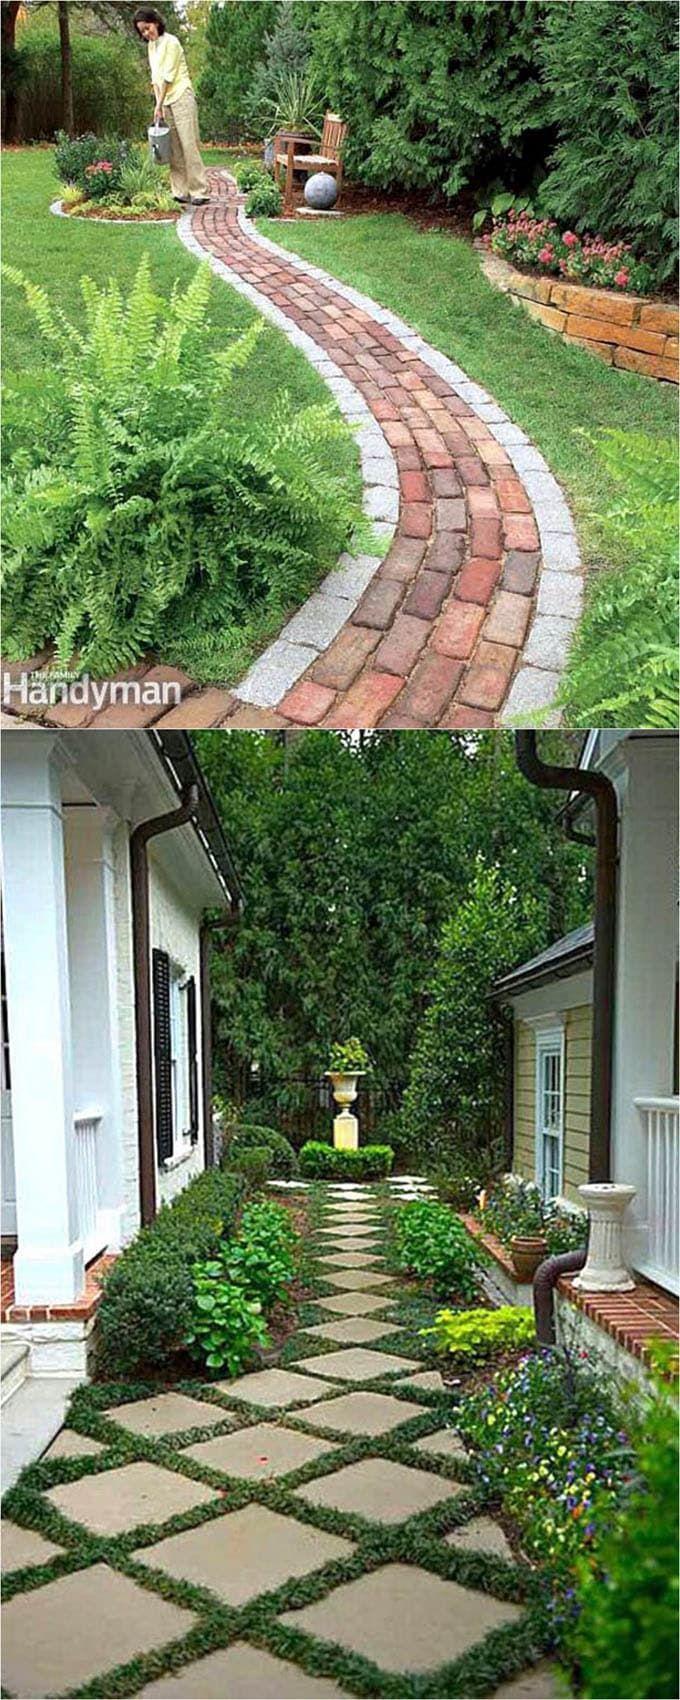 22826 Best Diy Gardening Ideas Images On Pinterest 400 x 300